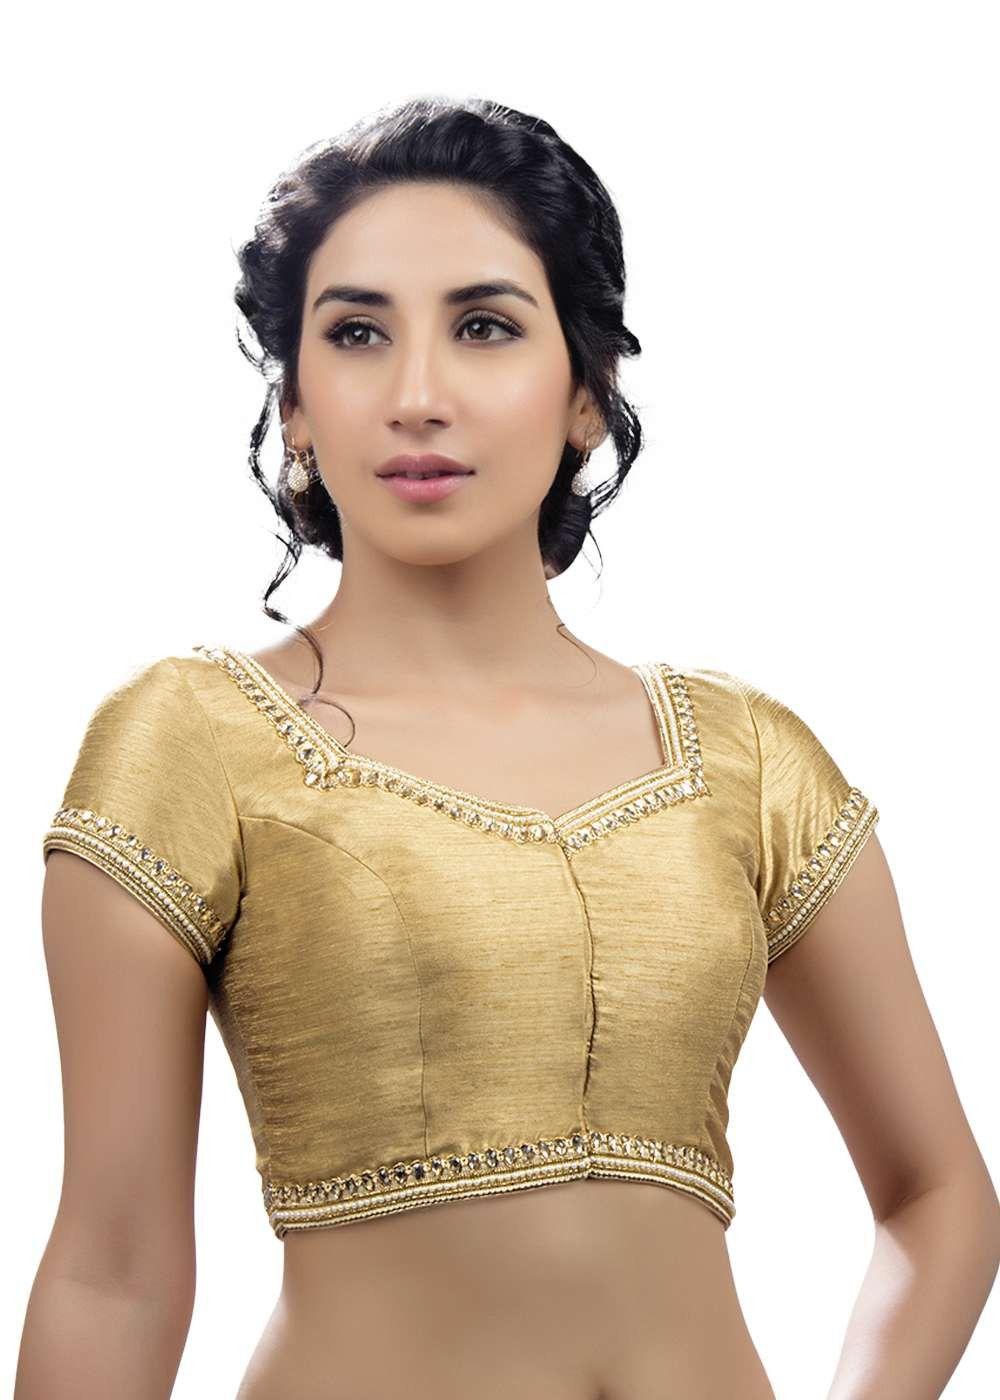 e874c1aa9c264e Ravishing Moti Laced Gold Ready-made Saree Blouse SNT-X-234-SL | Hot ...